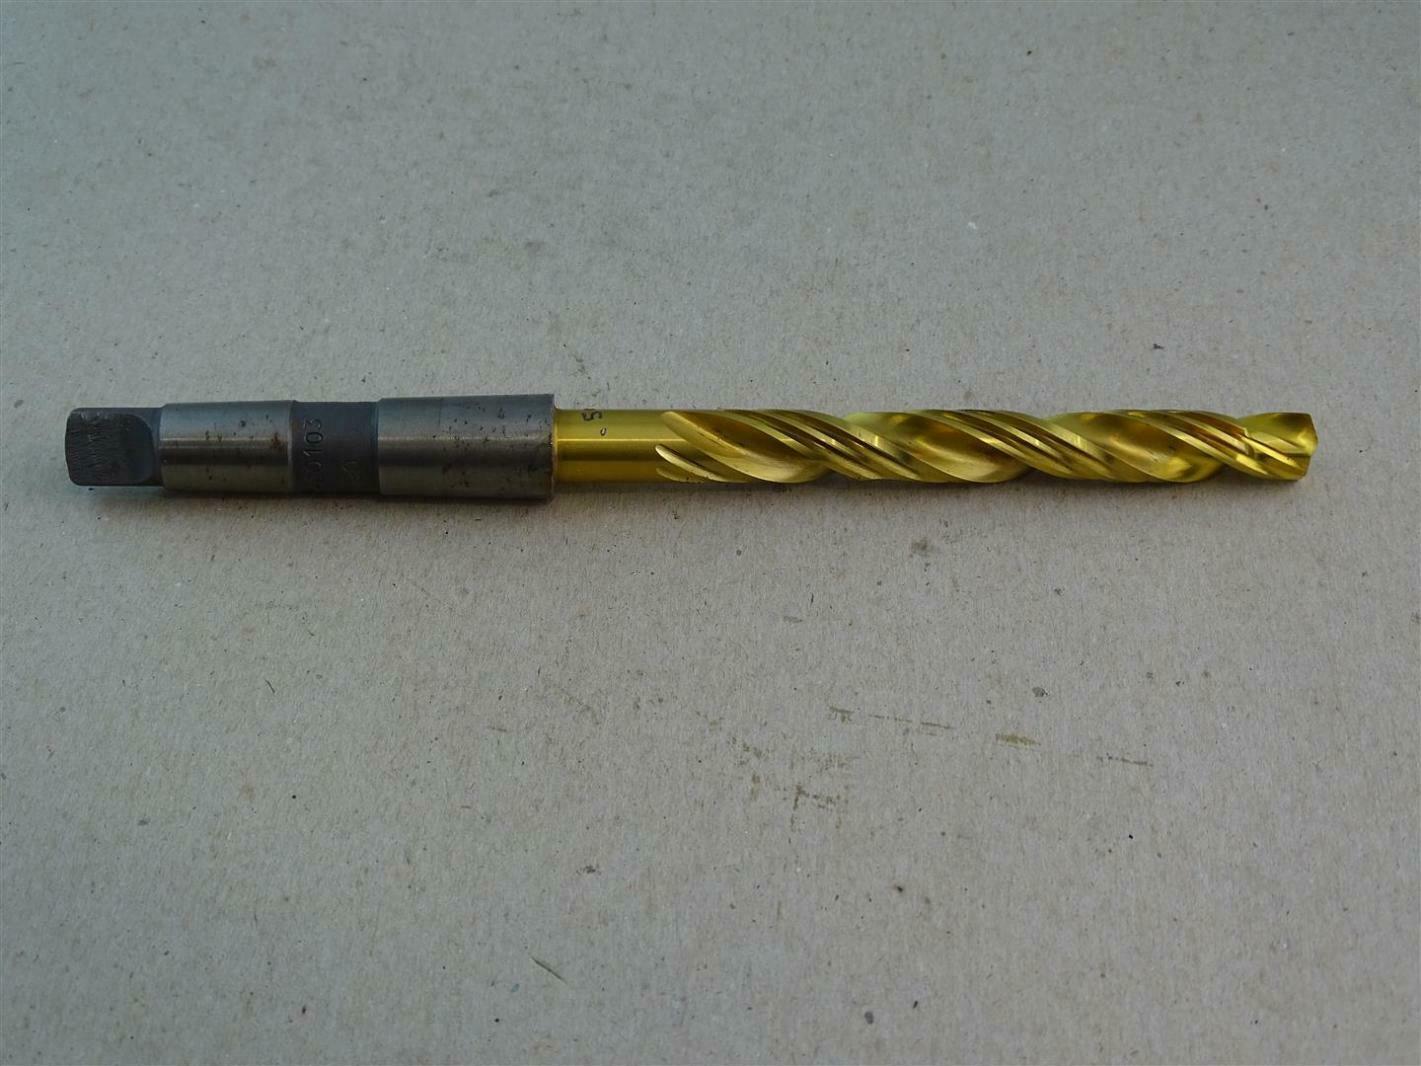 12mm Pilot PR-16100 new MELCUT Tools 16mm HSCo Cobalt TiN Coated Step Drill Bit